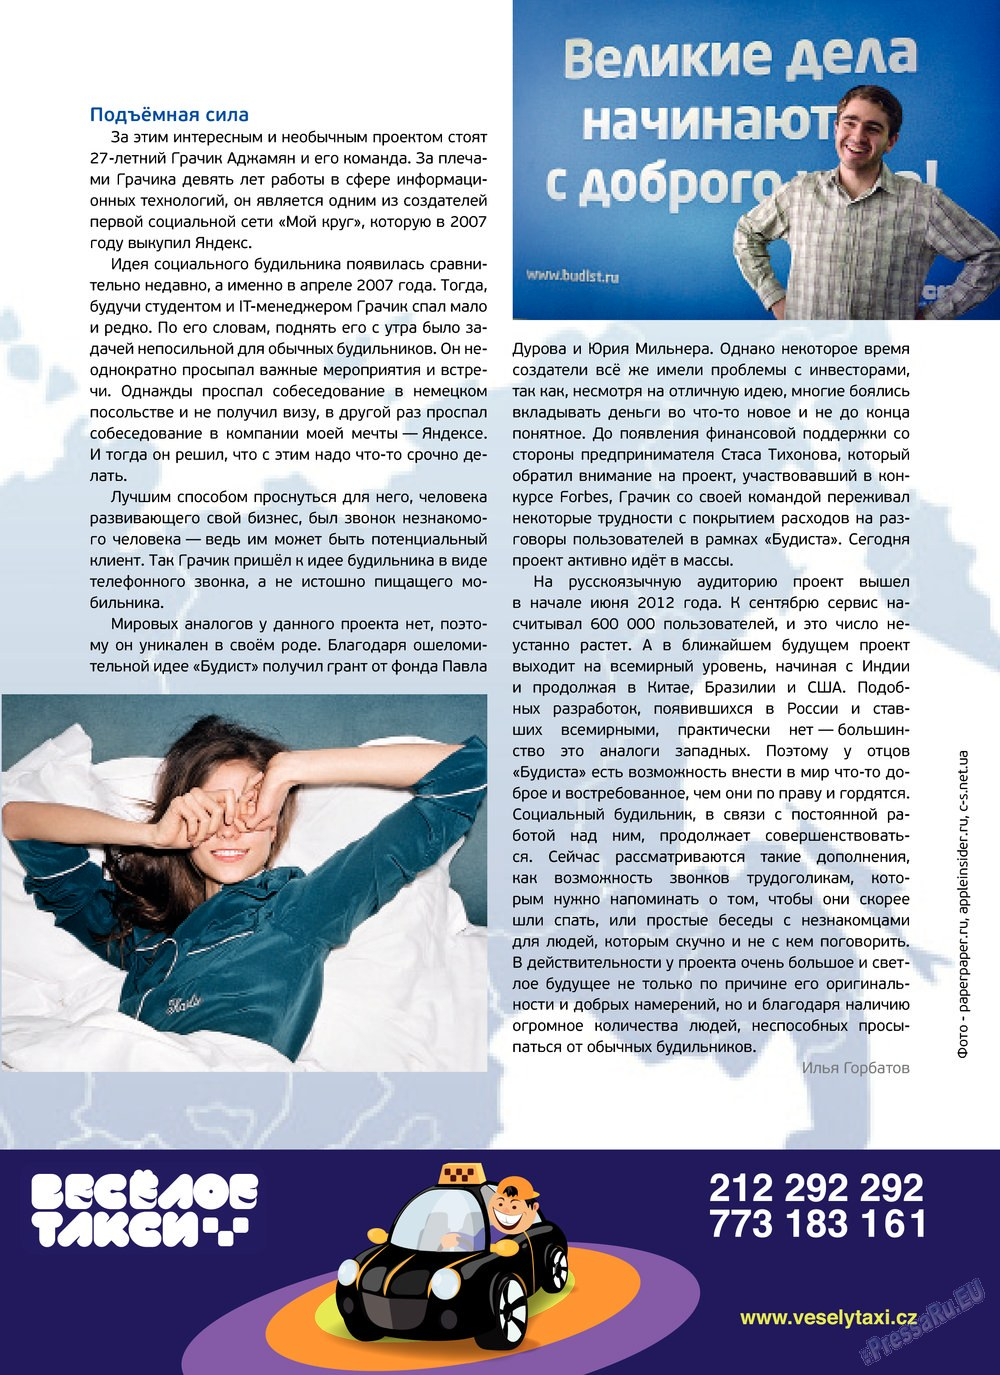 Артек (журнал). 2013 год, номер 1, стр. 27